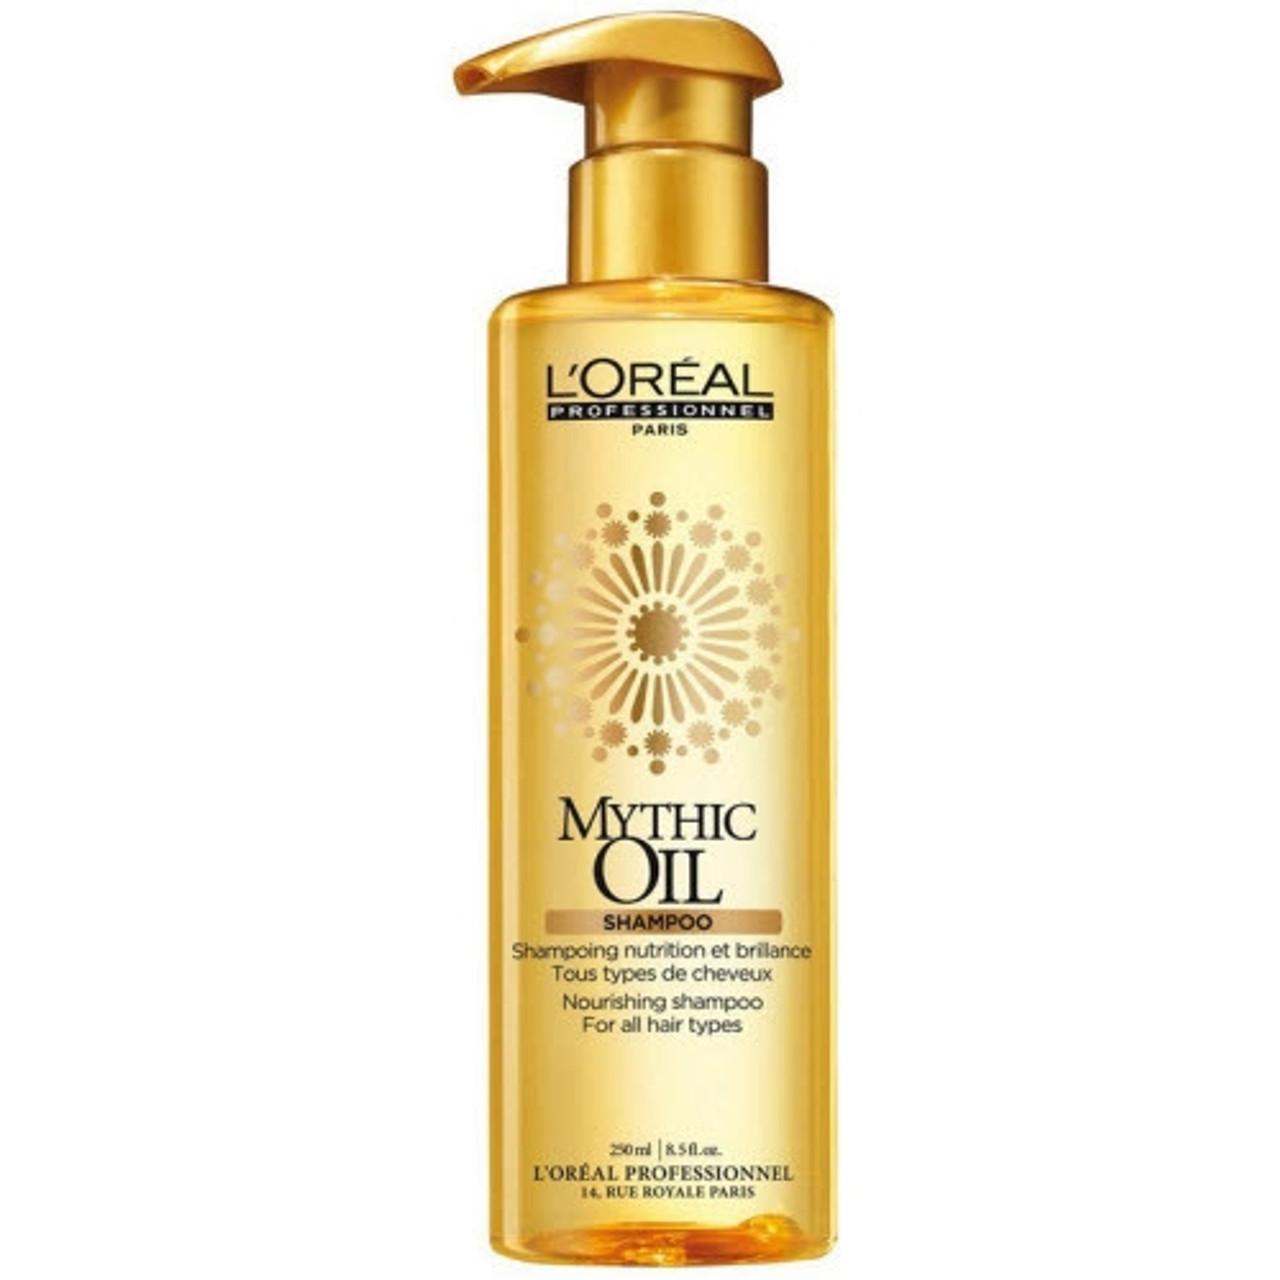 L'Oreal Mythic Oil Shampoo 8.5oz